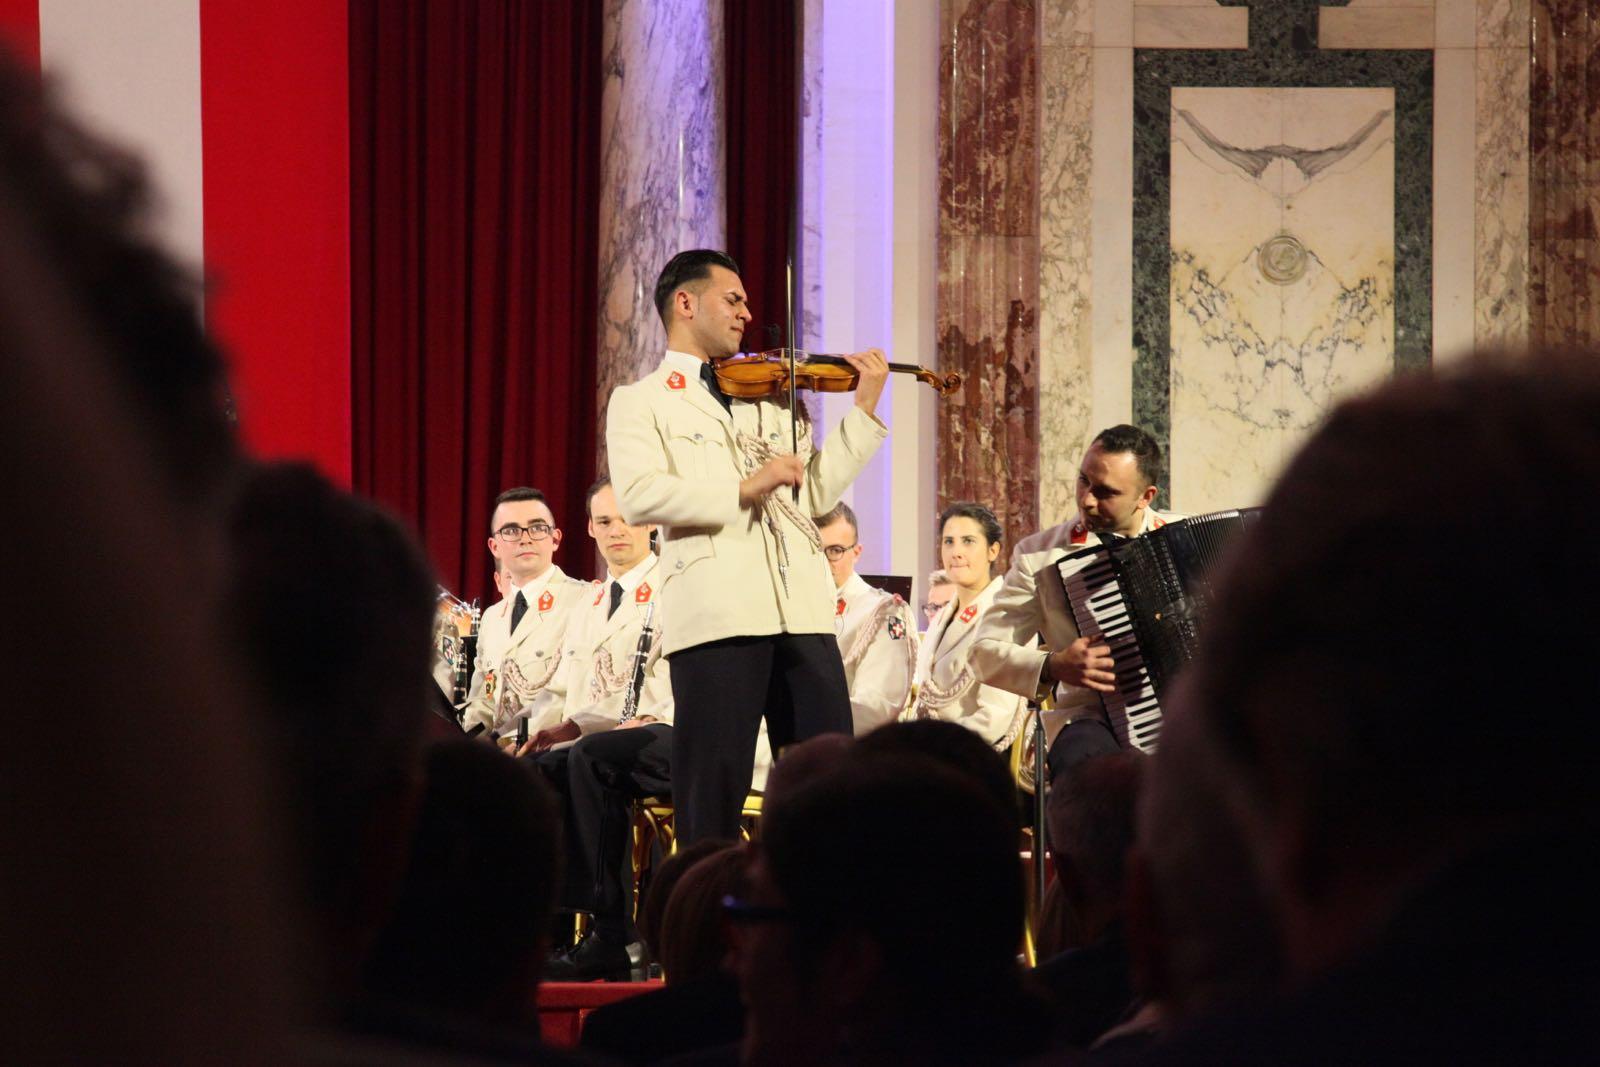 2019_03_14Gardemusik_Frühjahrskonzert_HBP_Hofburg - 102 of 177